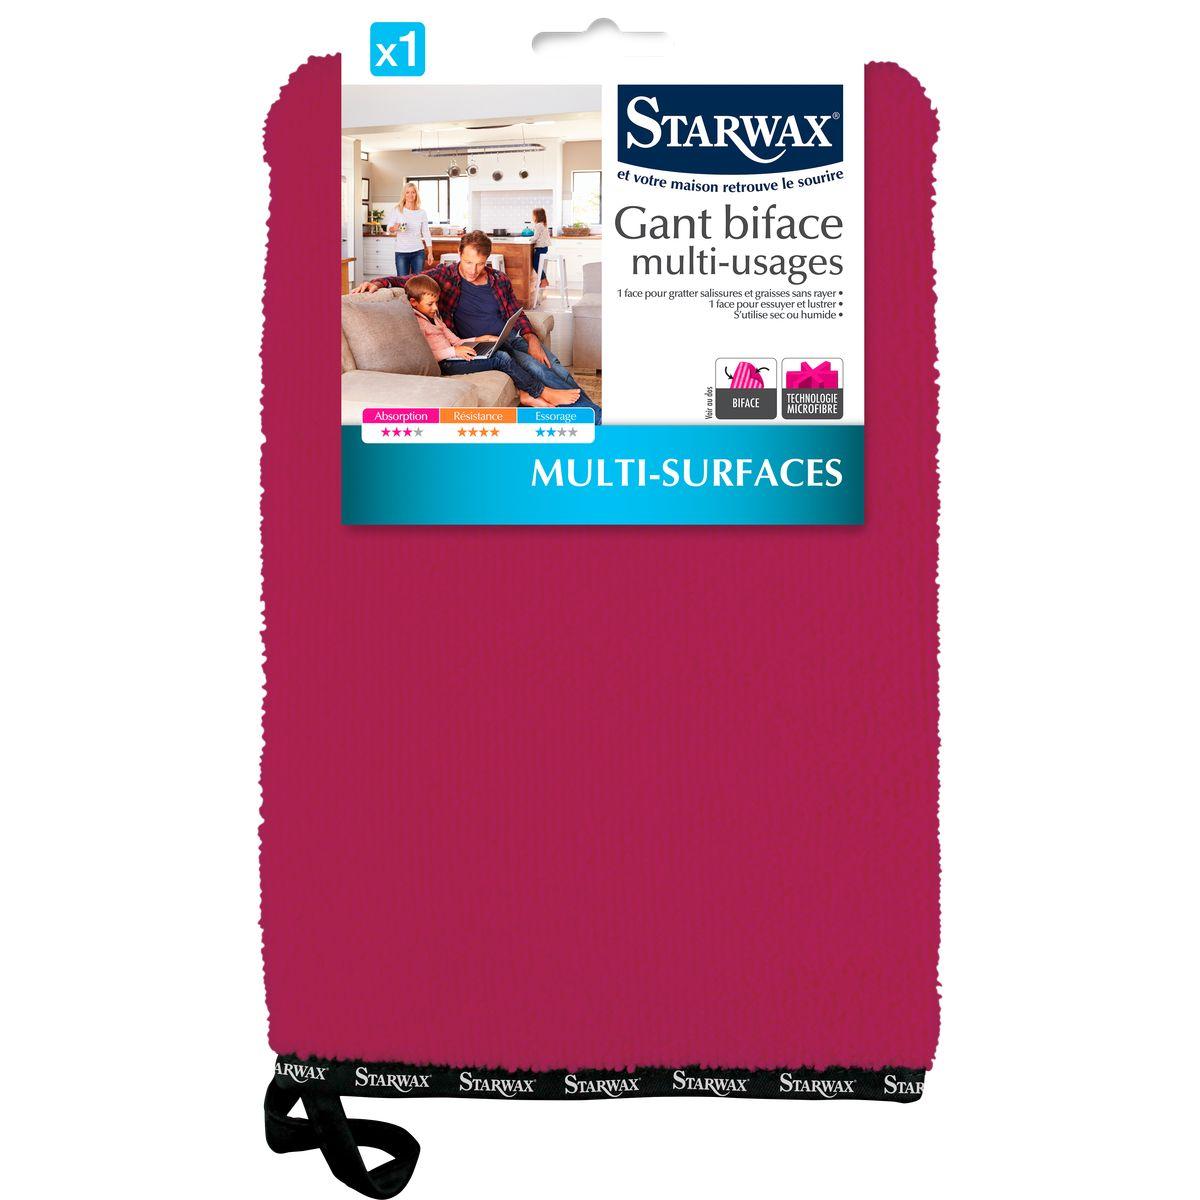 Gant microfibre biface multi-usages - Starwax